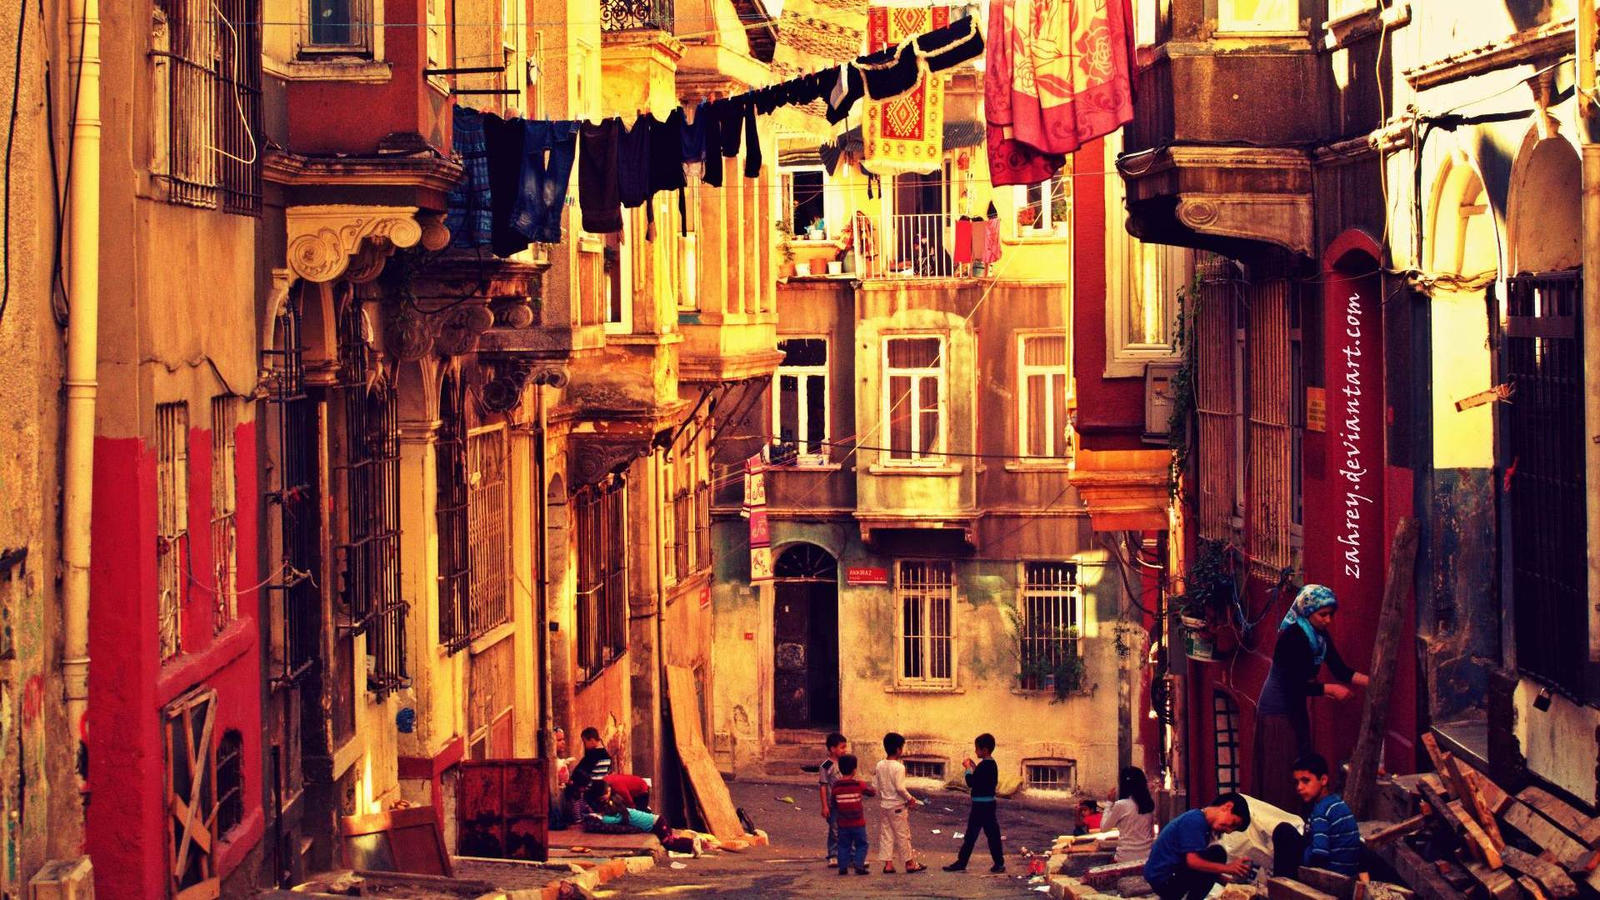 TARLABASI/Istanbul 1920x1080 wallpaper by zahrey